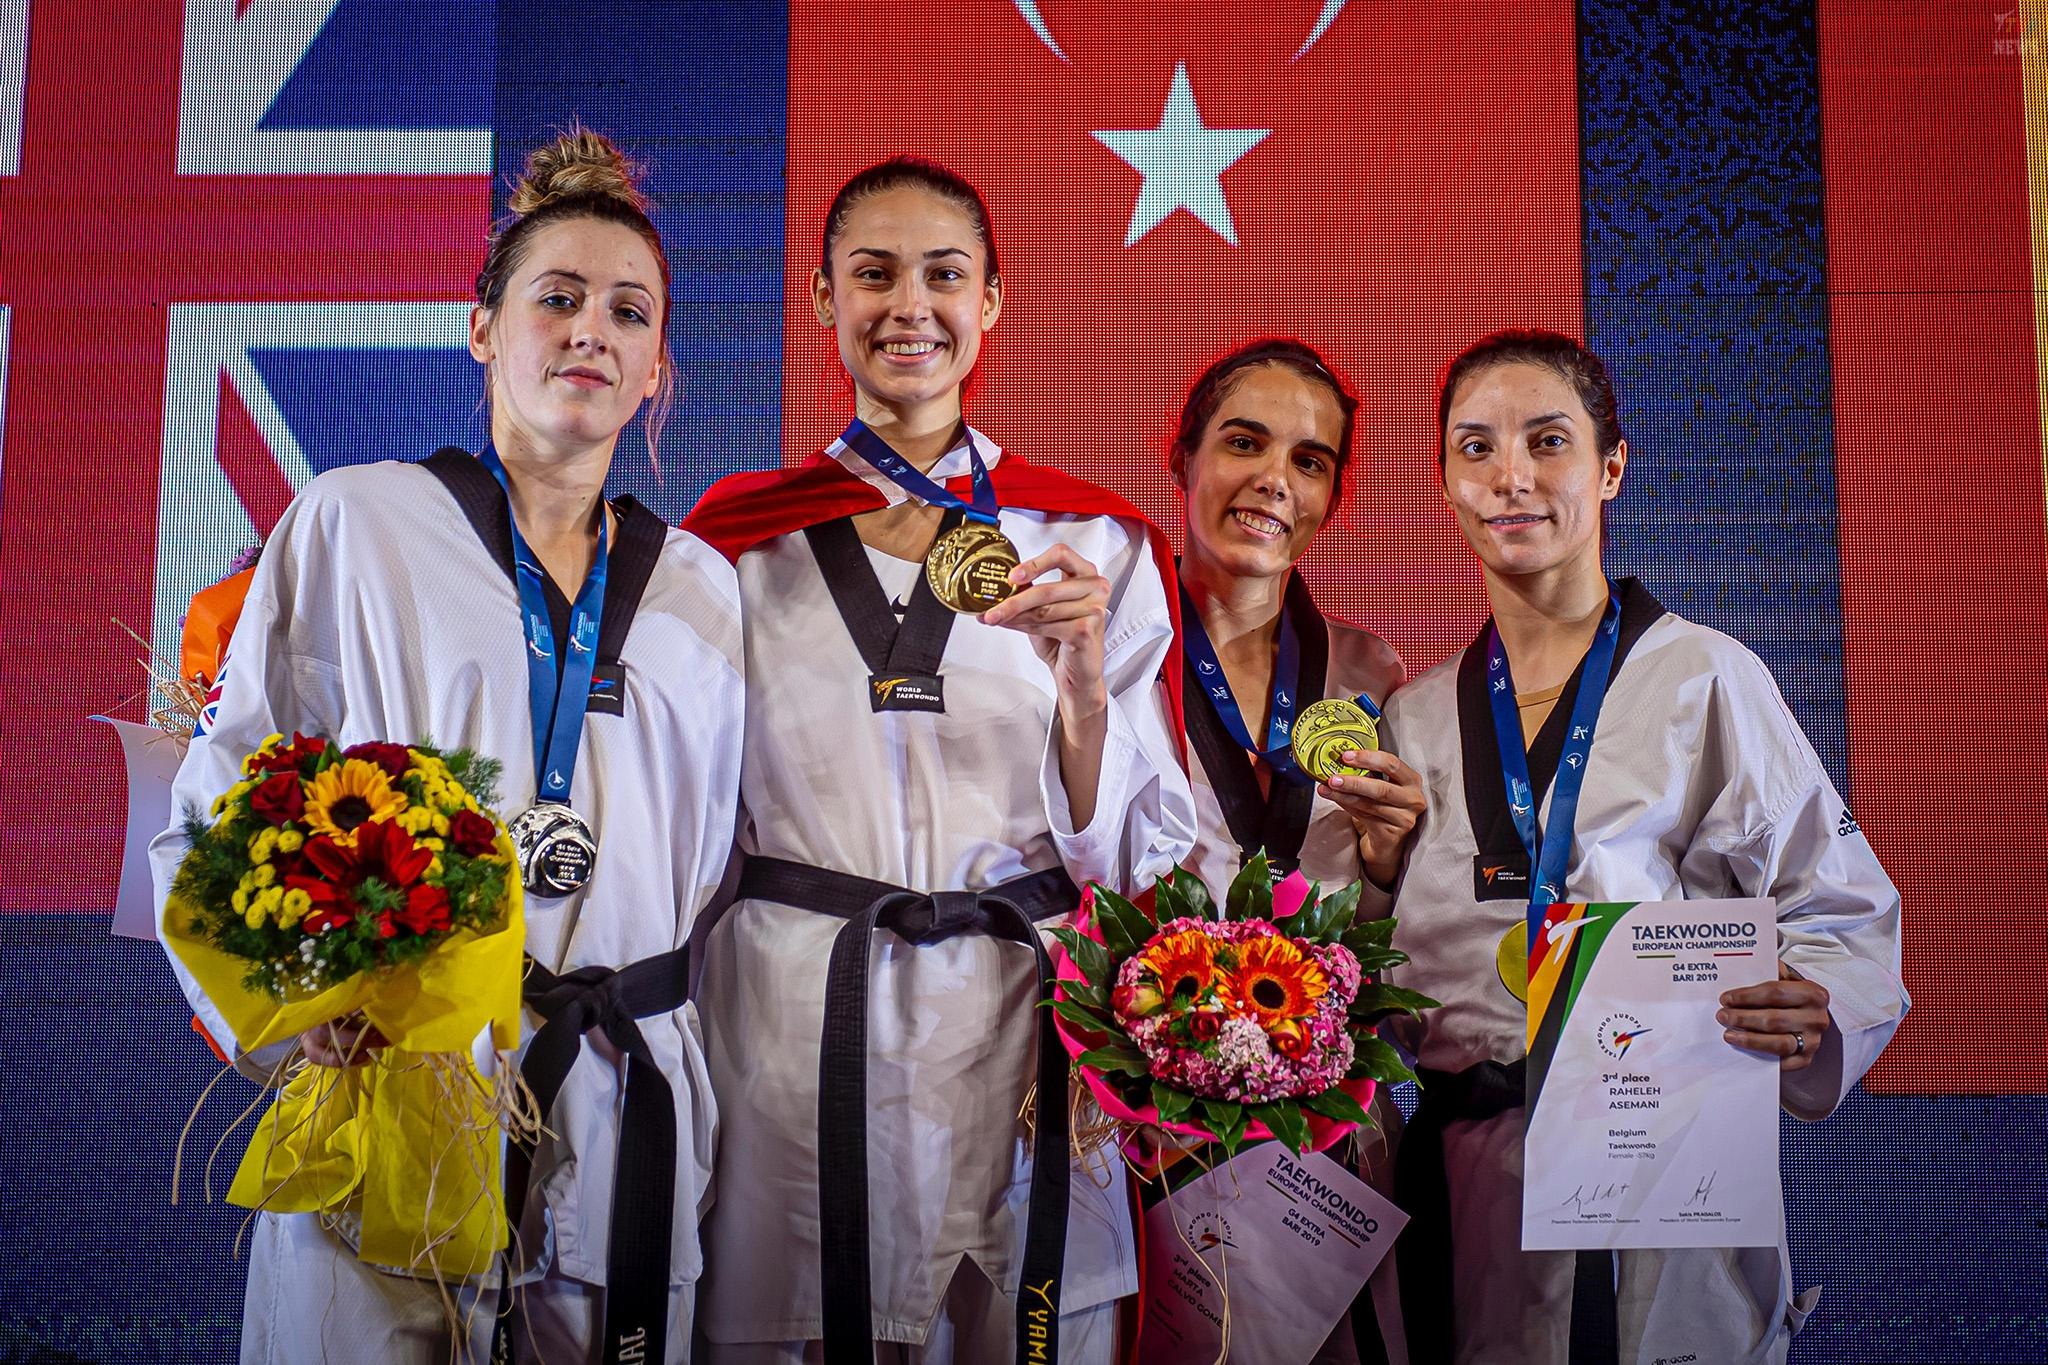 1572793046_female-57a_g4-extra-european-taekwondo-championships-bari-2019